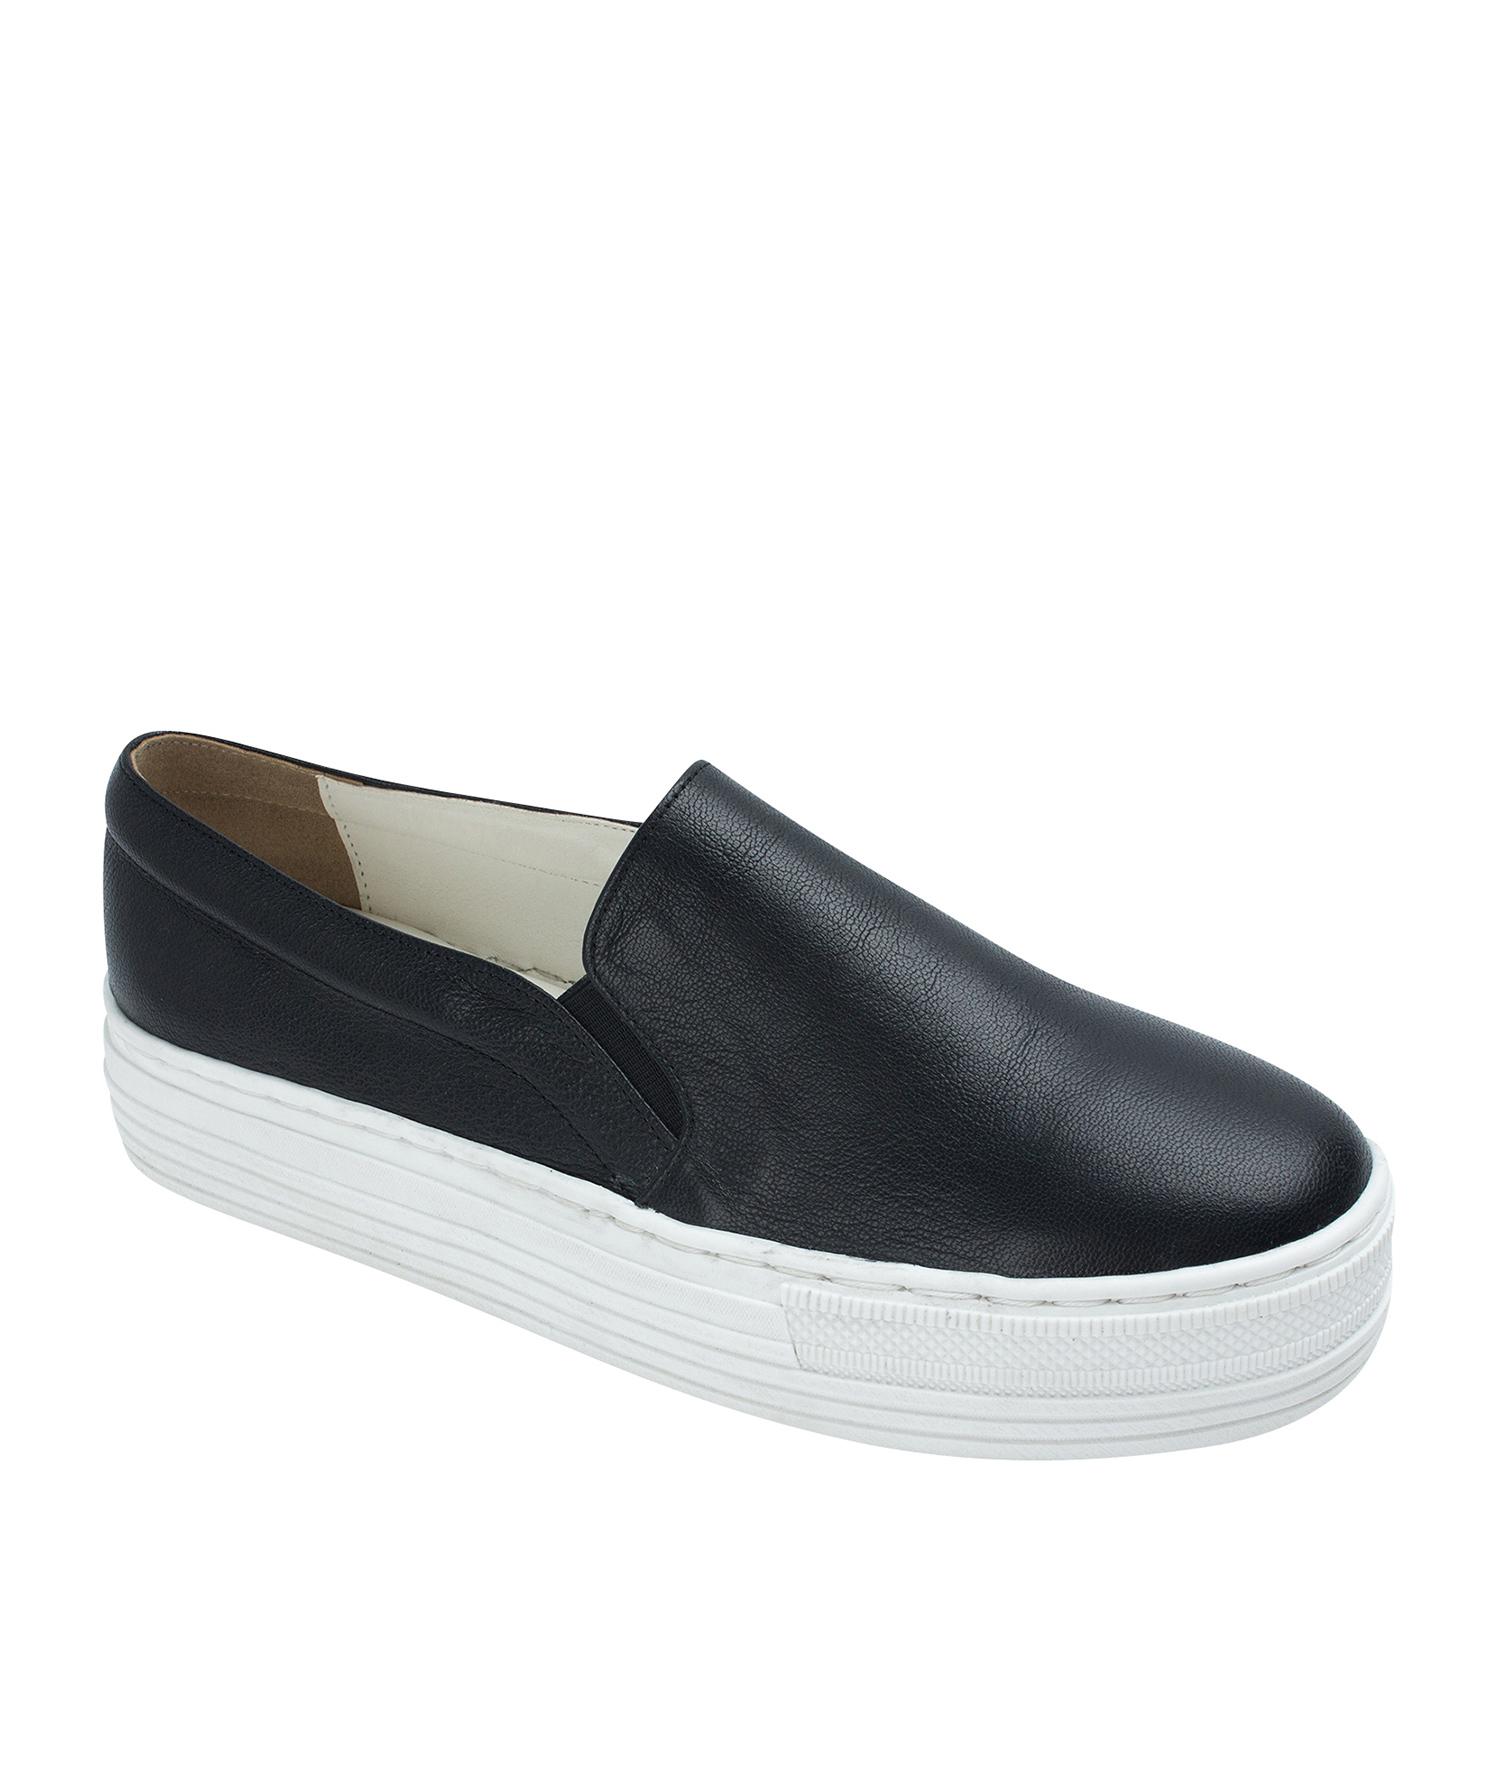 AnnaKastle Womens Leather Platform Slip On Sneakers Black c8e312152